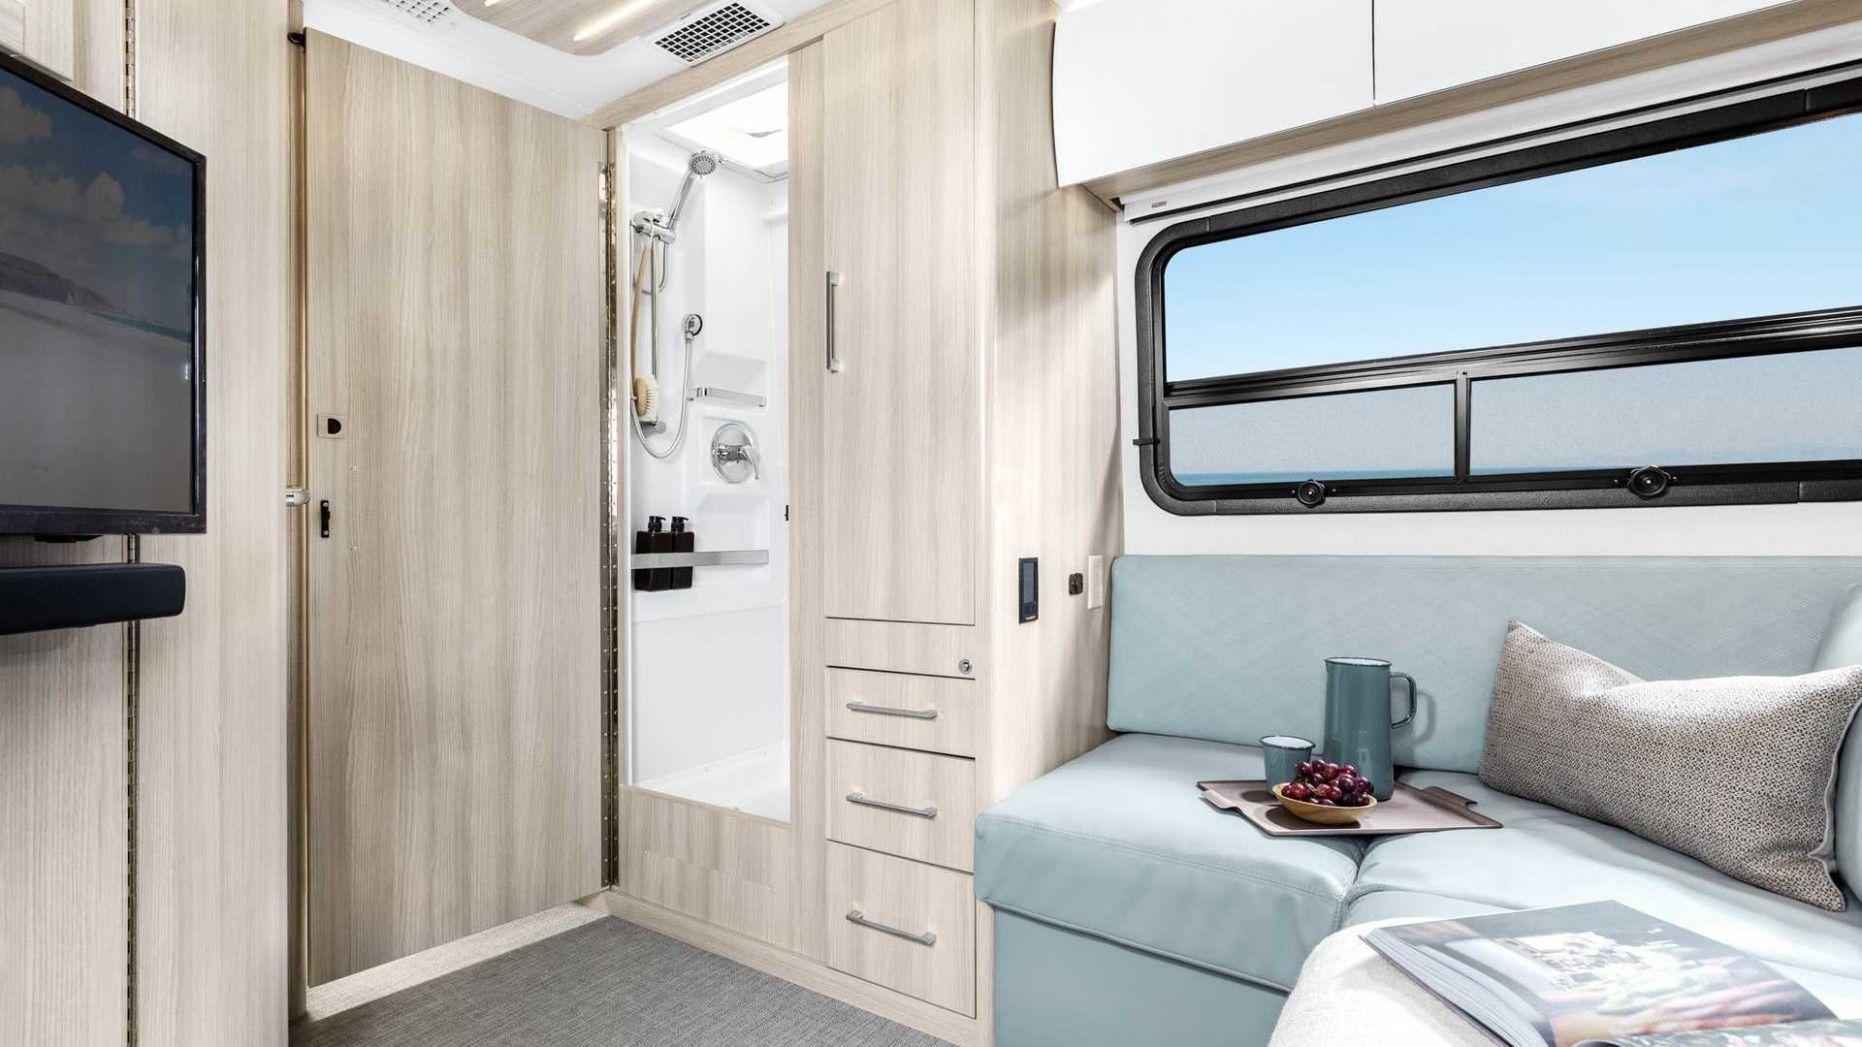 2020 Mercedes Unity Leisure travel vans, Luxury bedroom